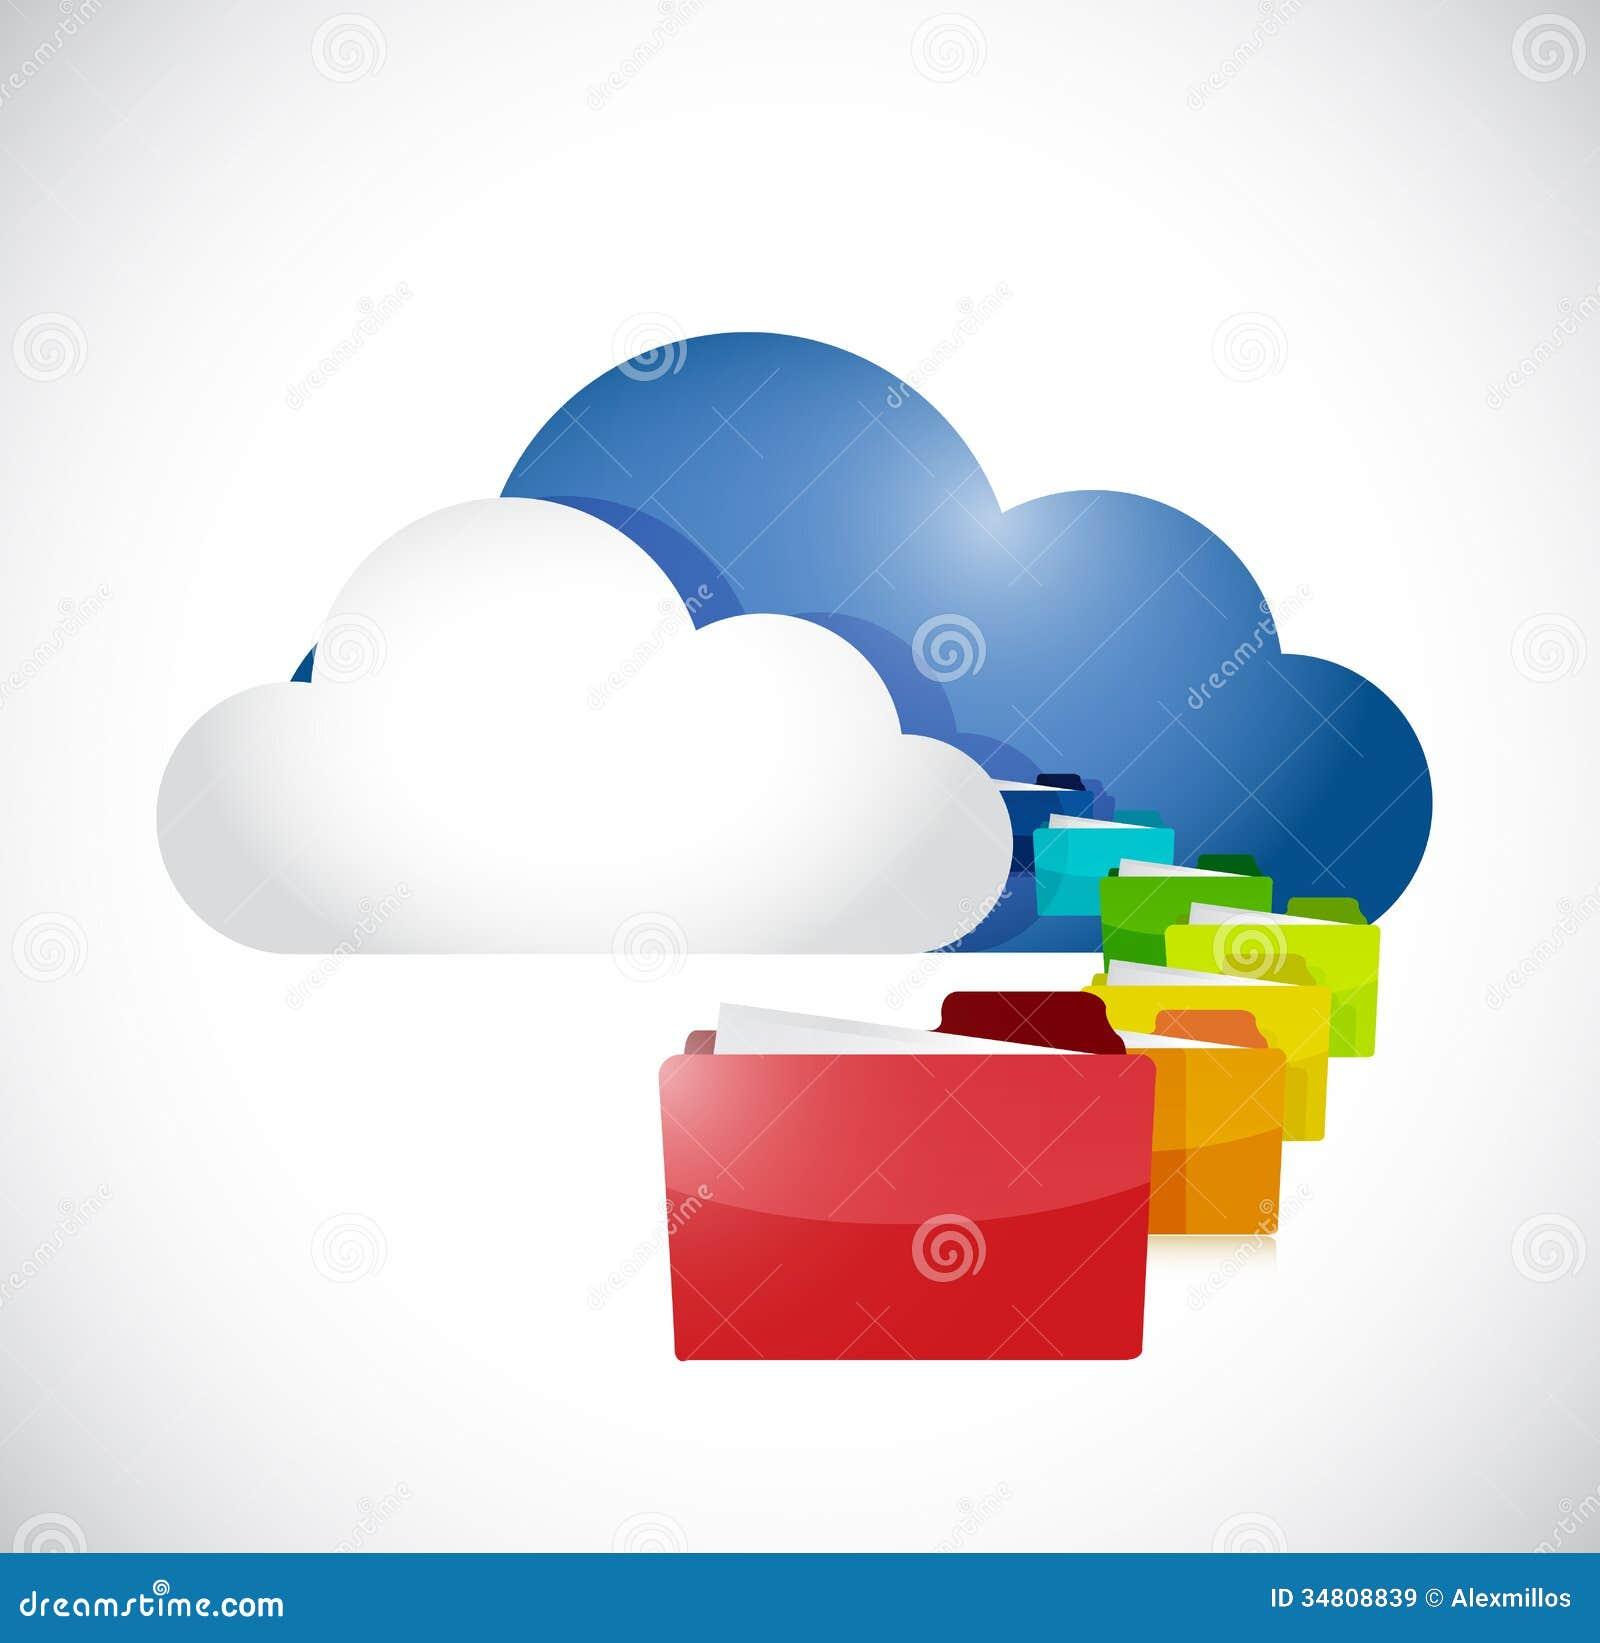 cloud computing 2012 cloud computing new papers mobile cloud computing ...